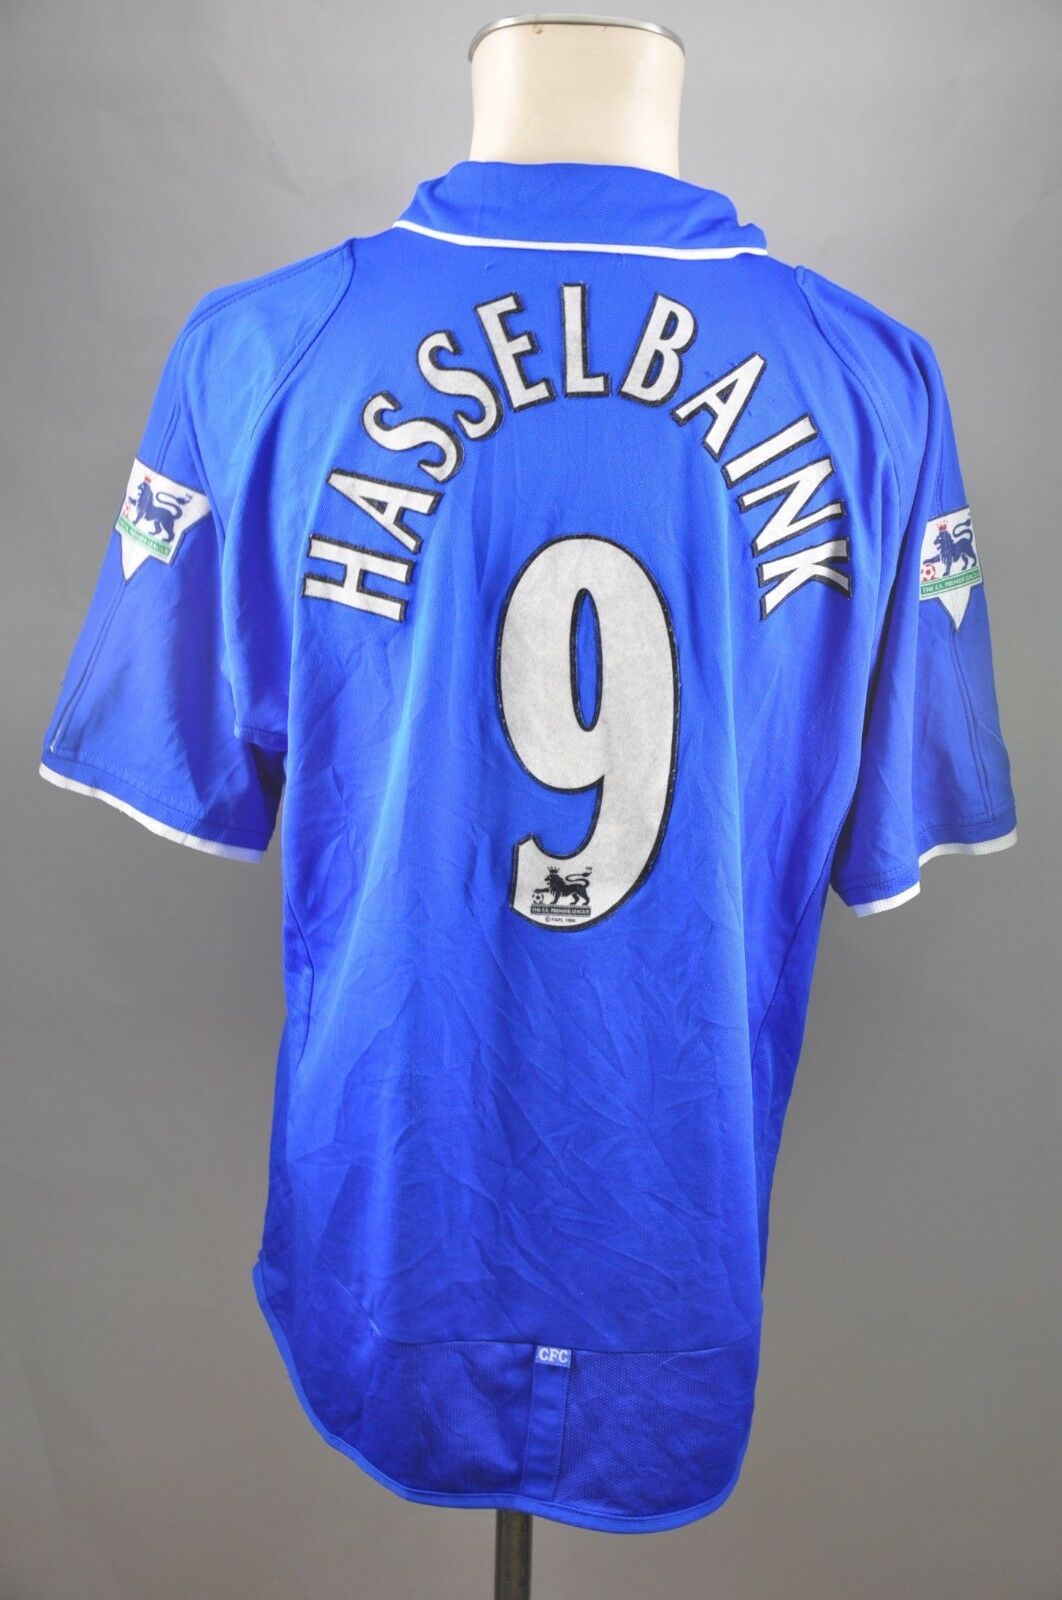 Chelsea London Trikot 2001-2002 Home Gr. L  9 Hasselbaink Jersey Home Umbro